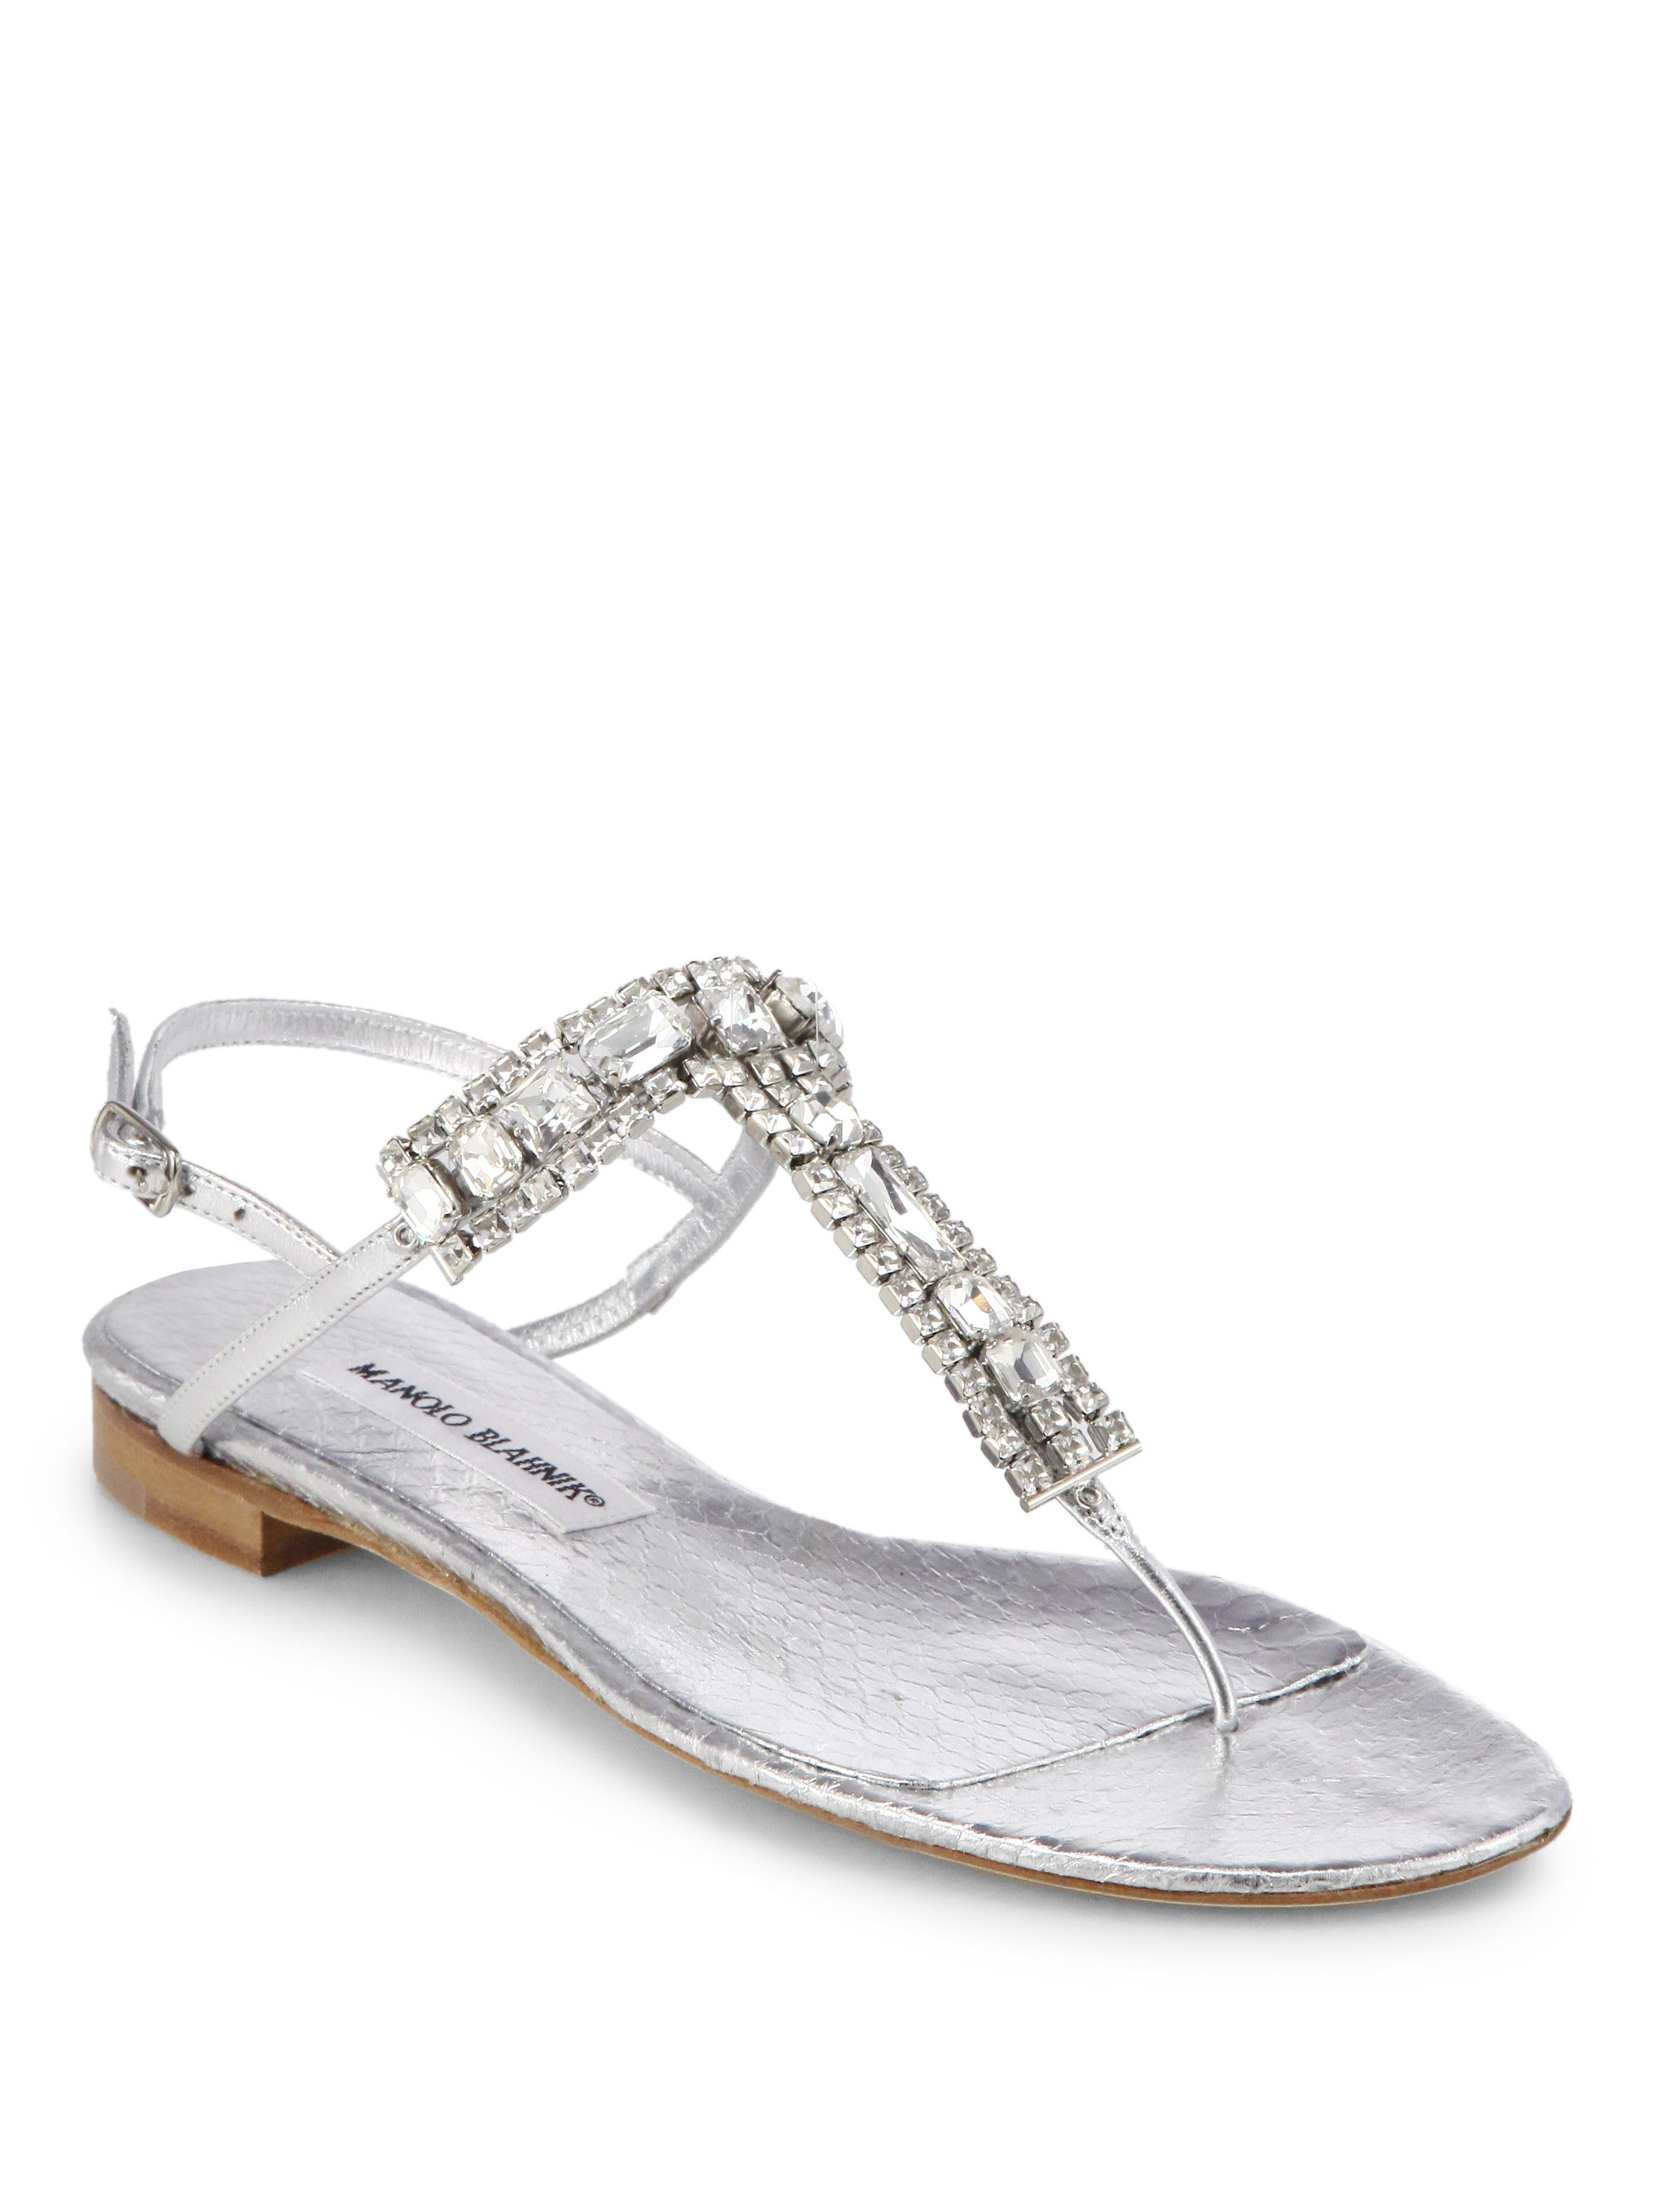 manolo blahnik flat shoes uk